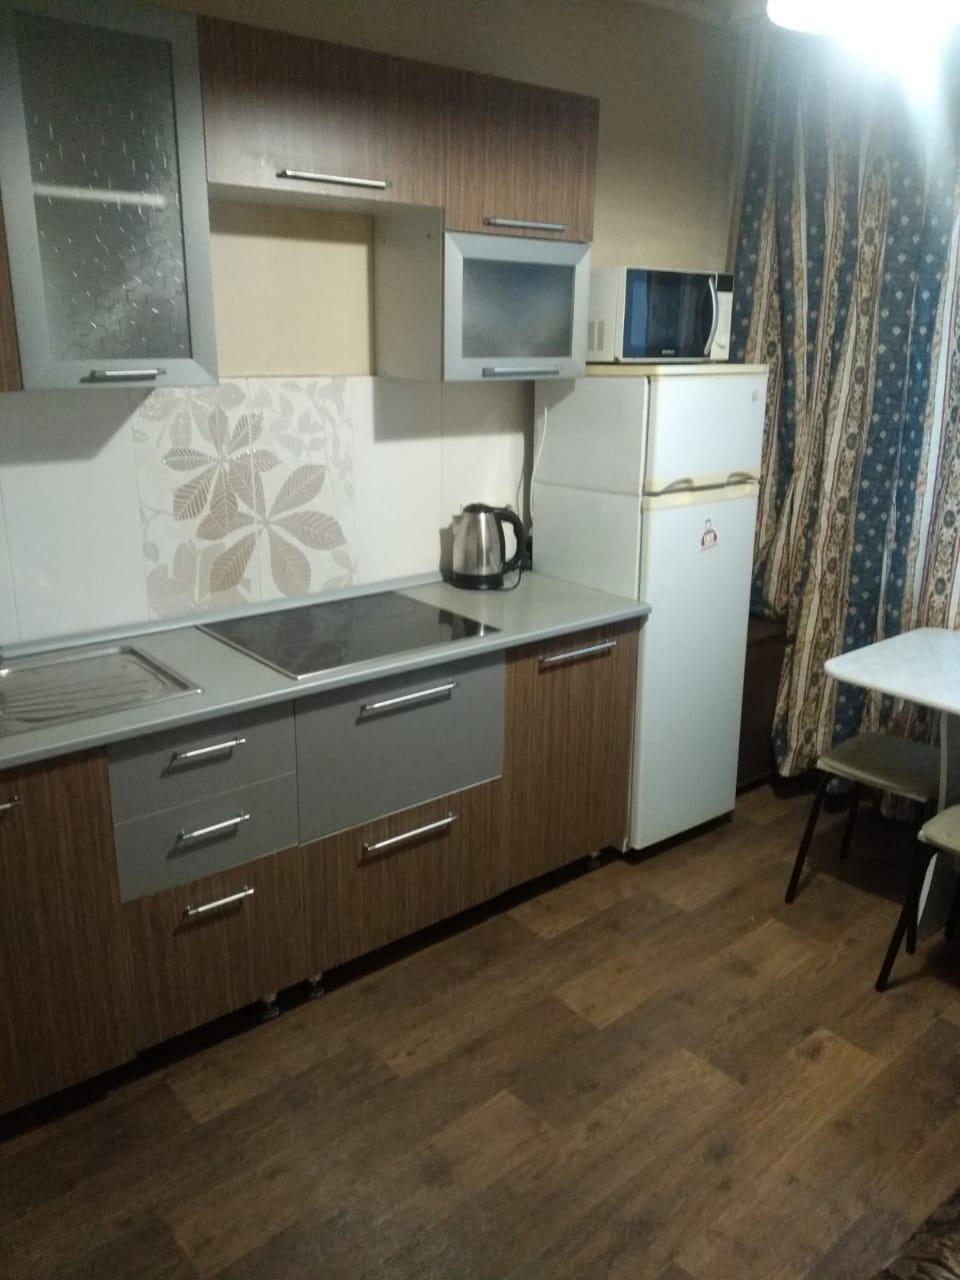 1к квартира улица Вербная, 10   16000   аренда в Красноярске фото 2